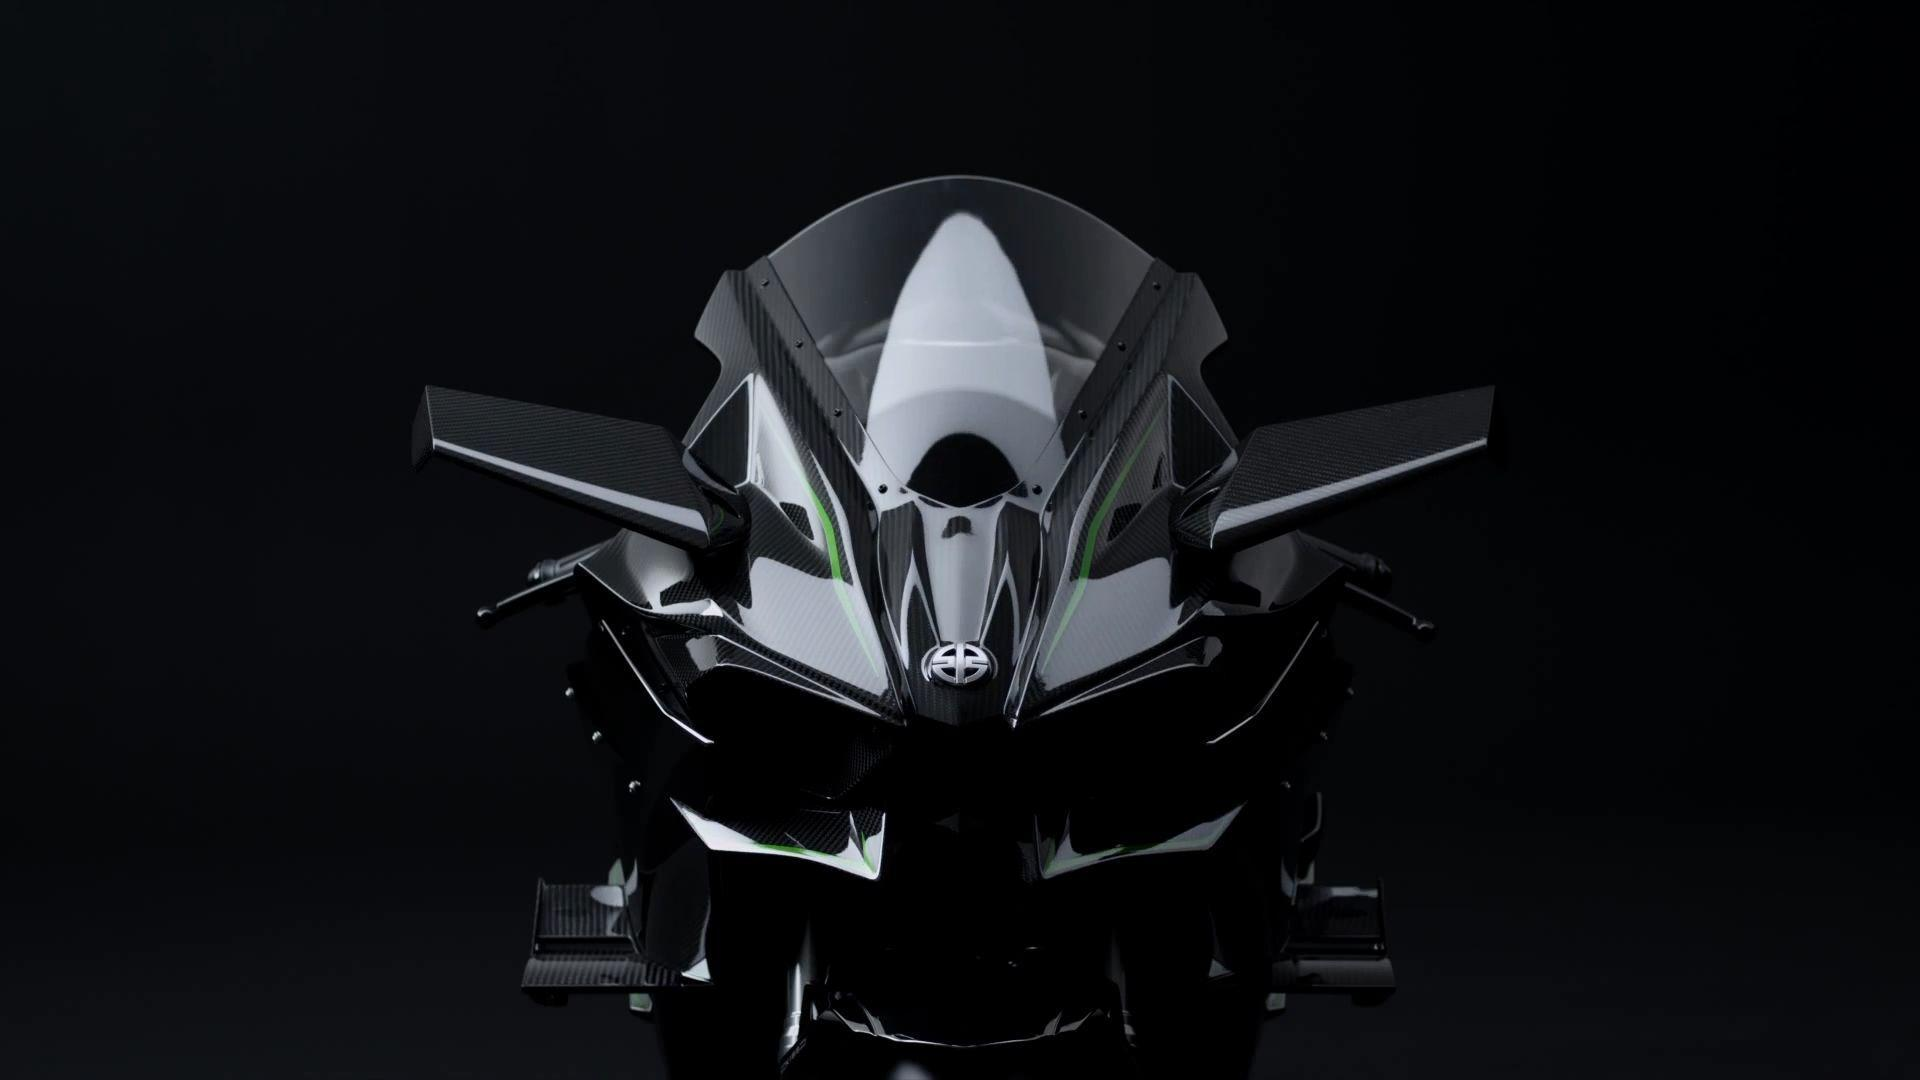 Kawasaki Ninja H2R HD Wallpaper Download 3D 4K Kawasaki Ninja Bike ...